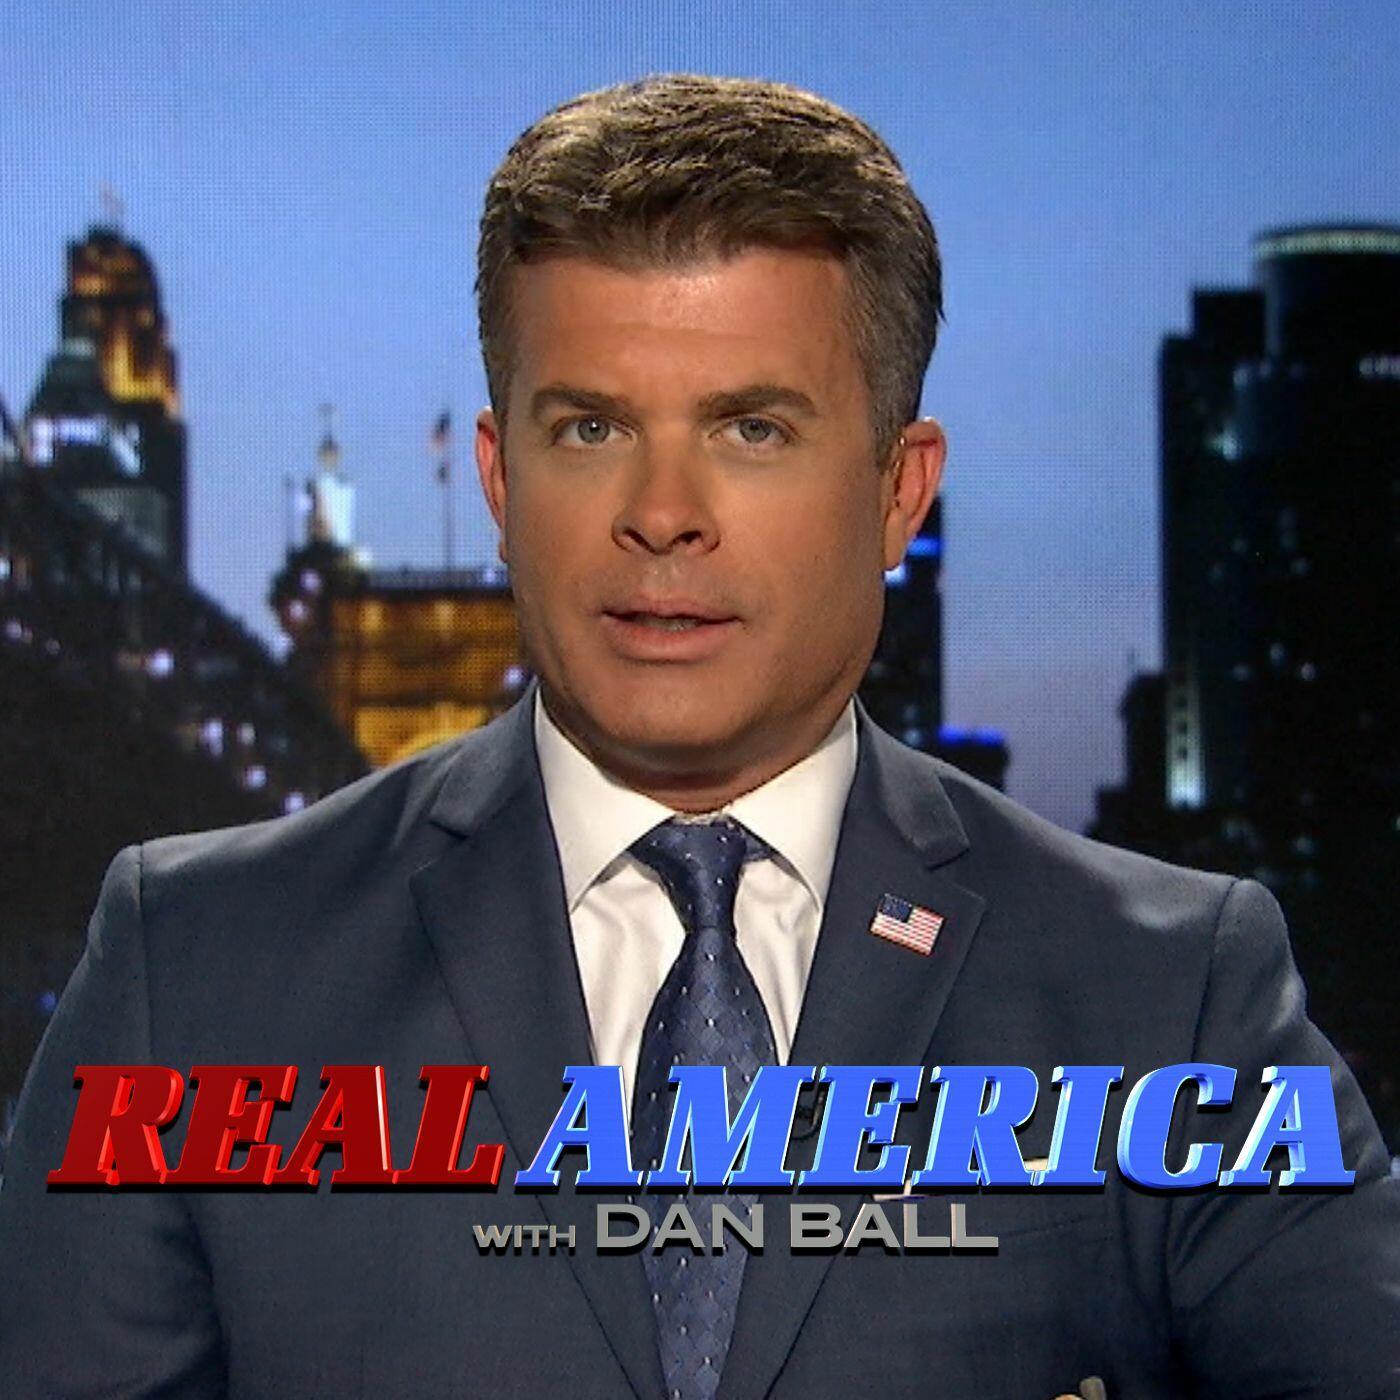 Real America with Dan Ball